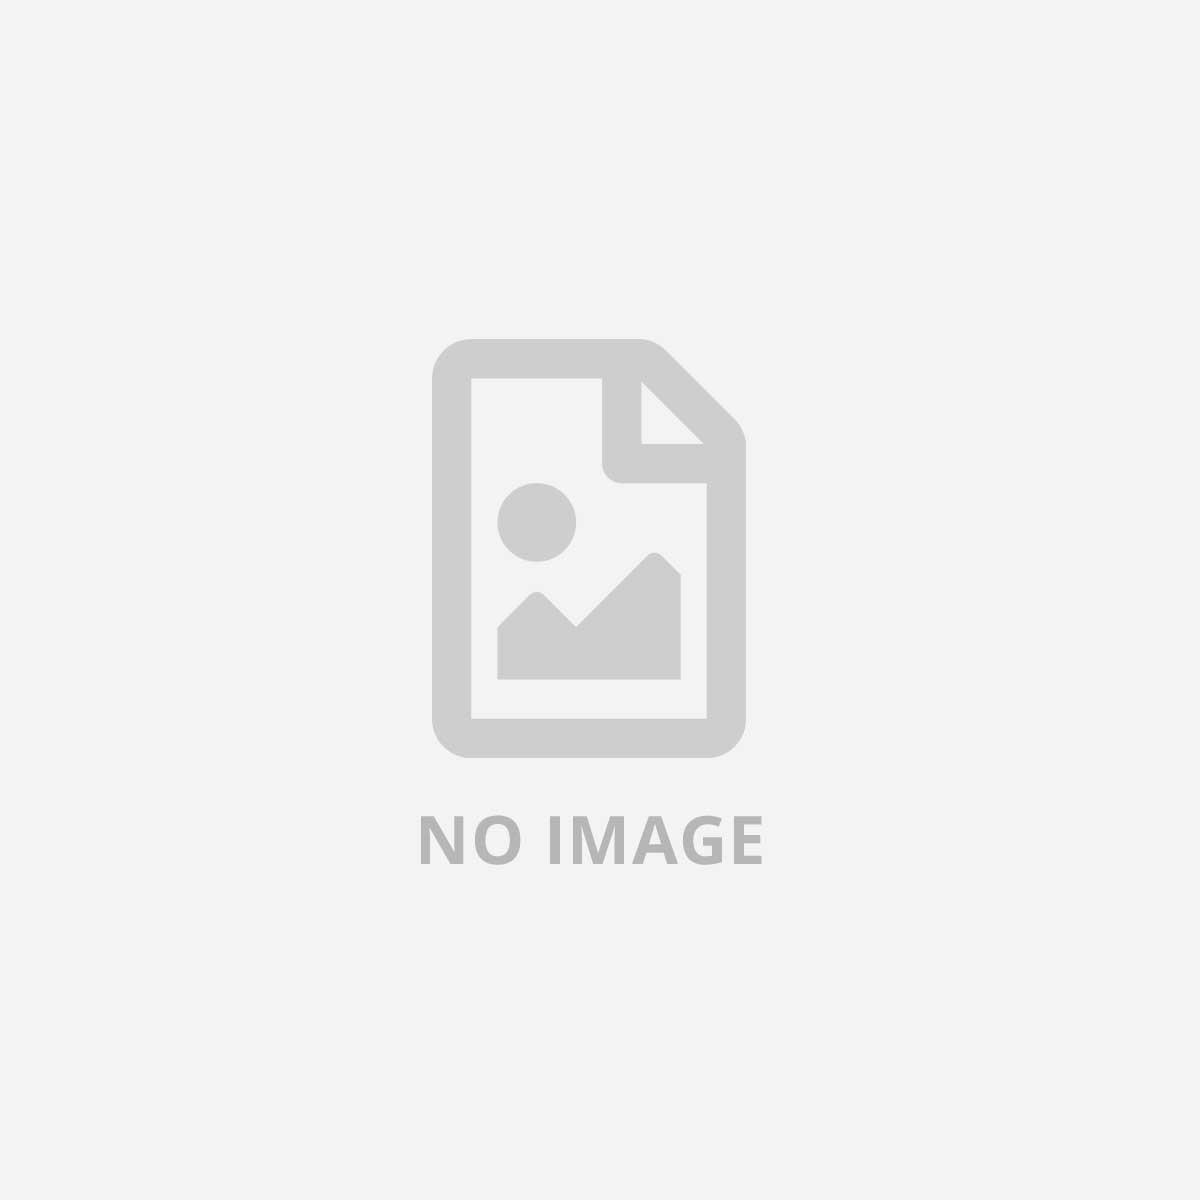 EPSON CARTA SPECIALE OPACA MATTE A3+